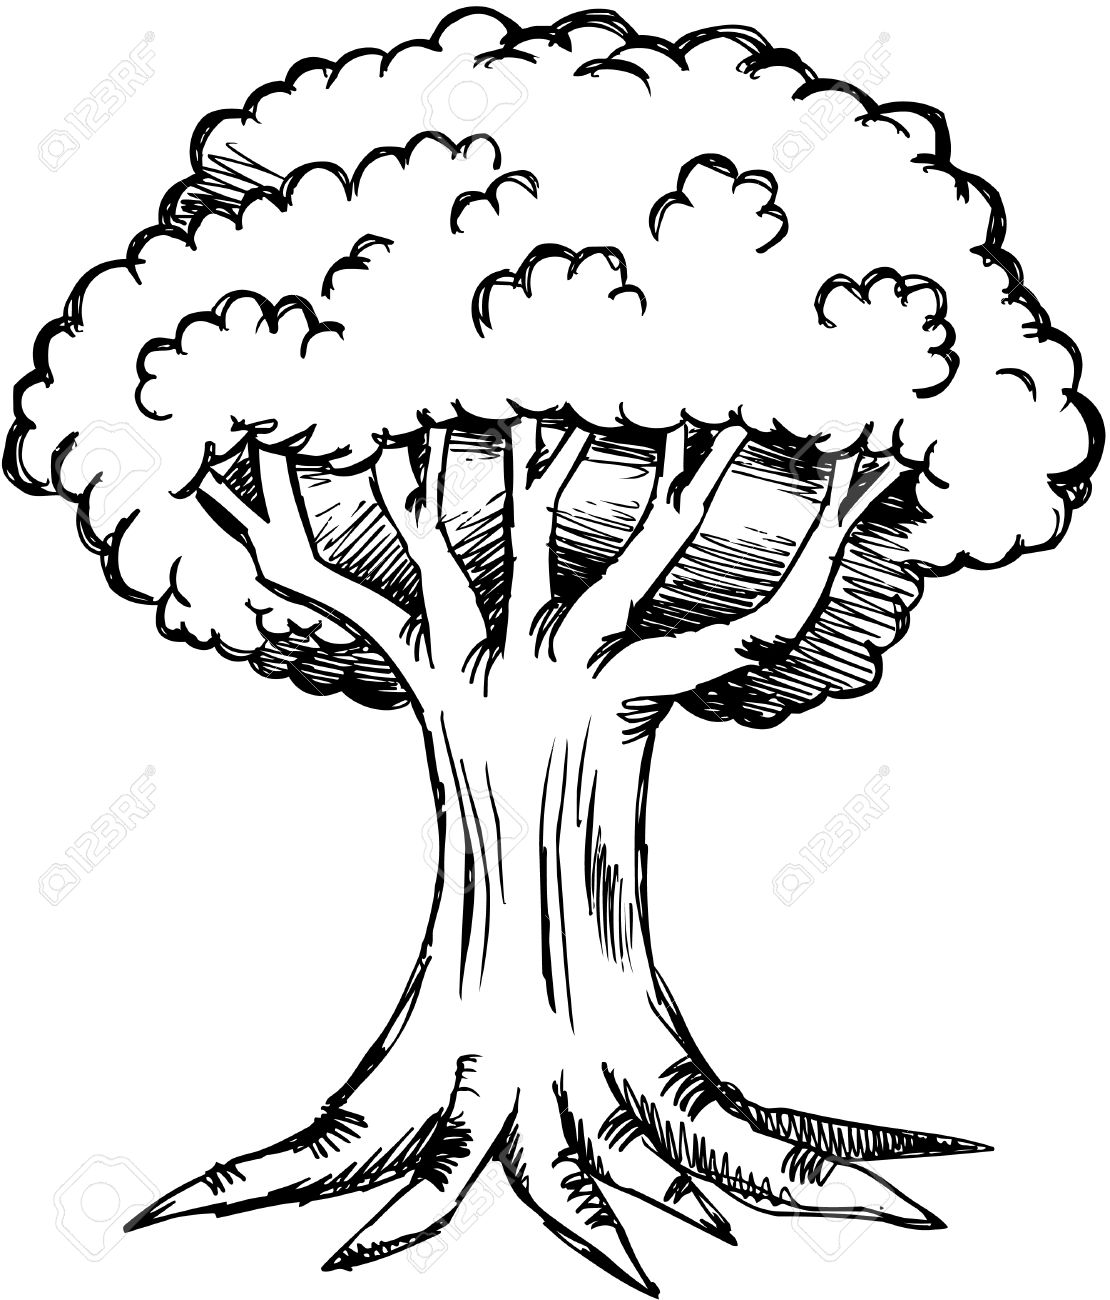 1110x1300 Sketchy Oak Tree Illustration Royalty Free Cliparts, Vectors,